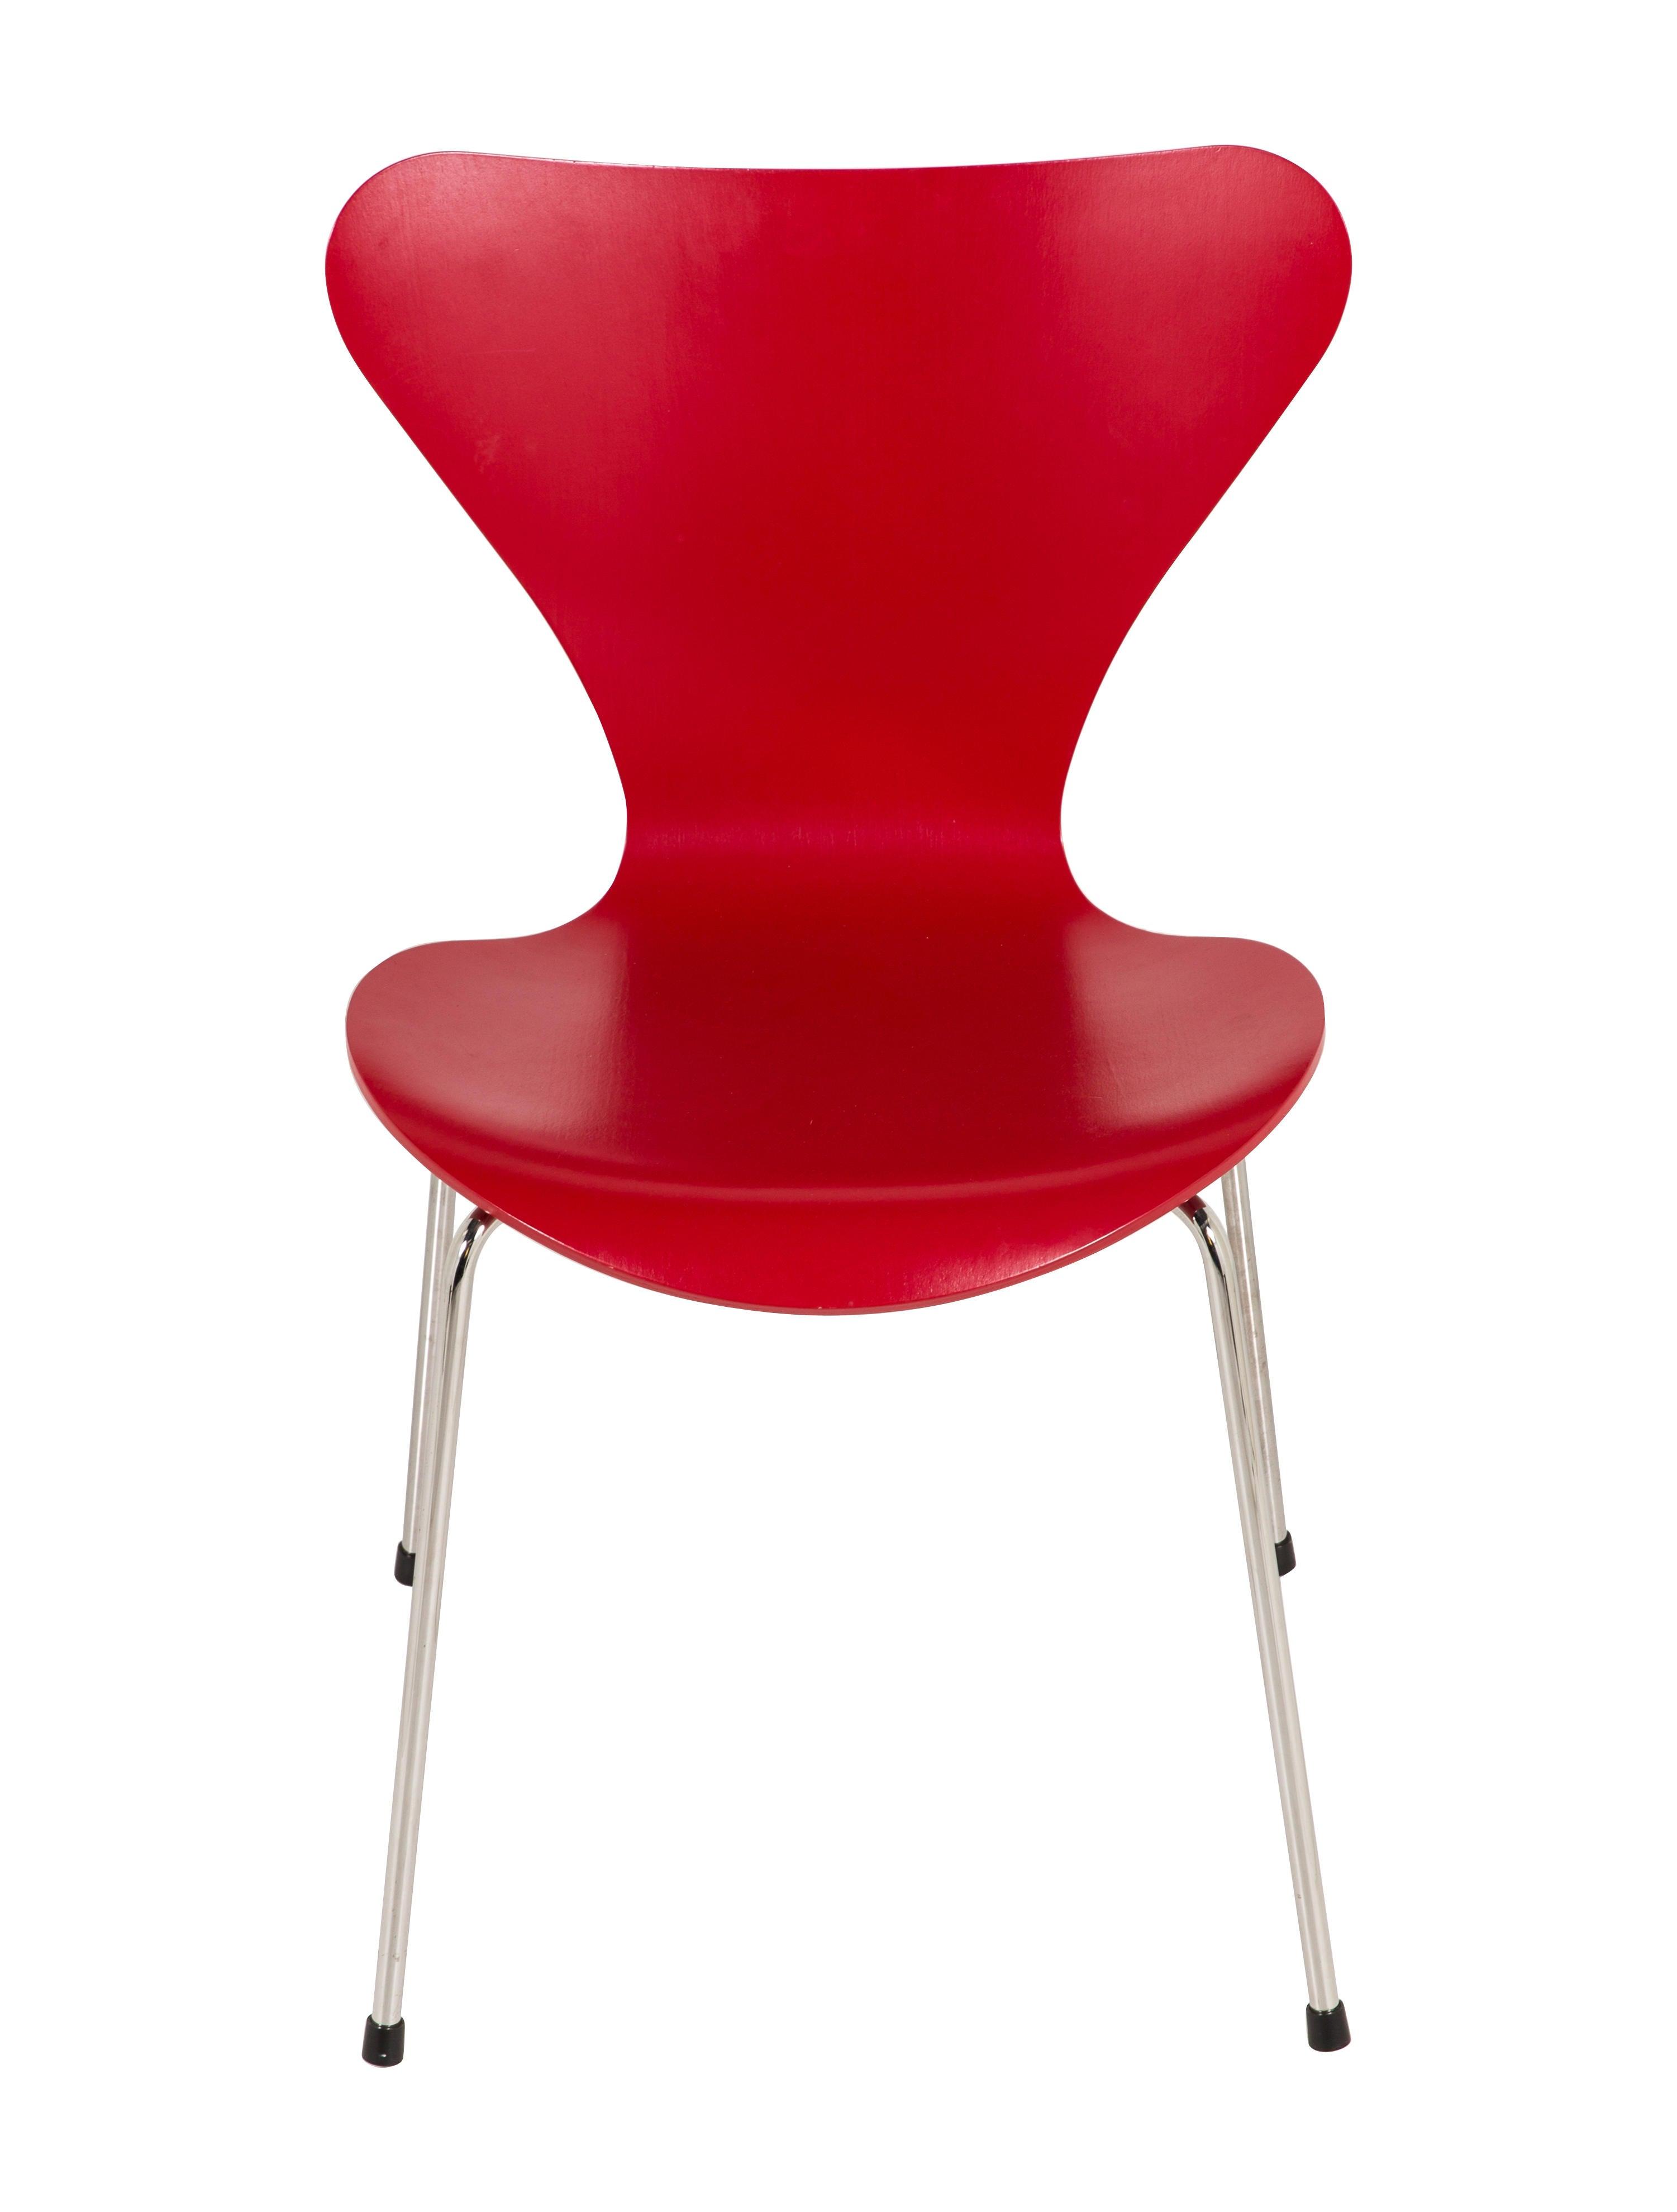 fritz hansen arne jacobson series 7 chair furniture. Black Bedroom Furniture Sets. Home Design Ideas